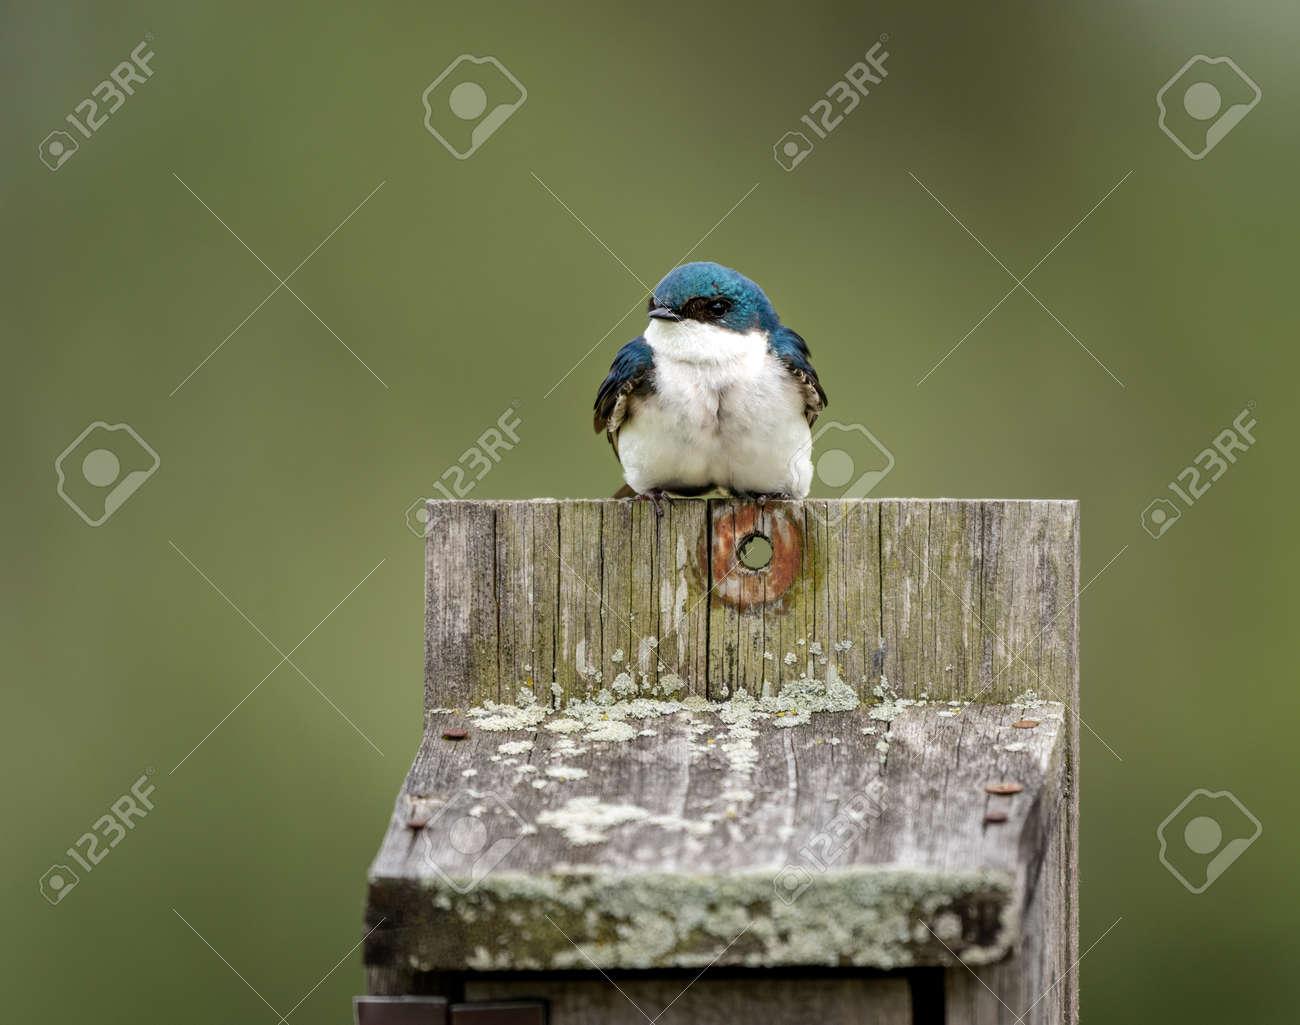 A tree swallow sitting on a birdbox. - 169836104